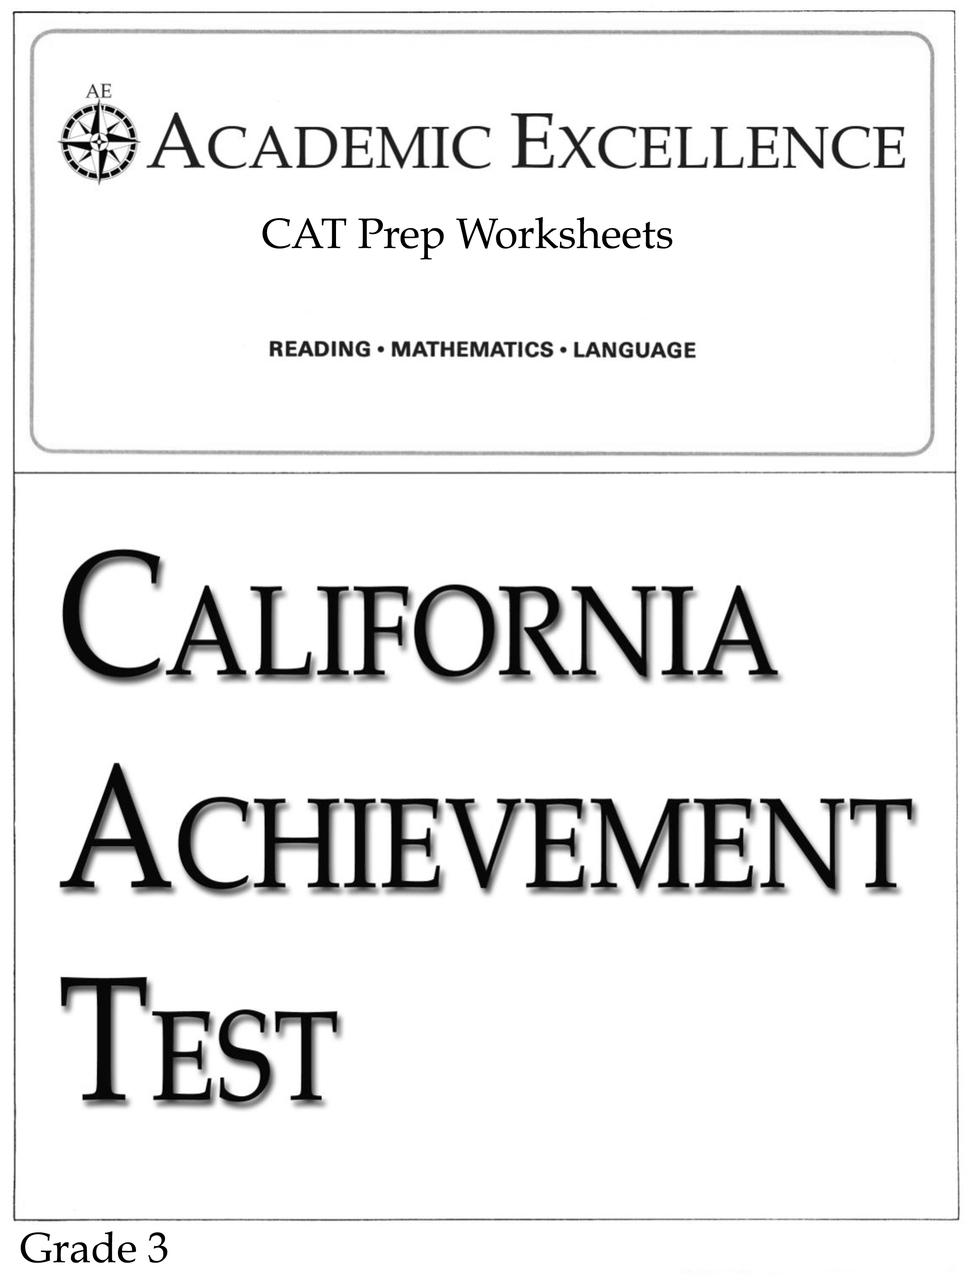 CAT Prep Pack: Grade 3 - PDF Download - Academic Excellence [ 1280 x 968 Pixel ]